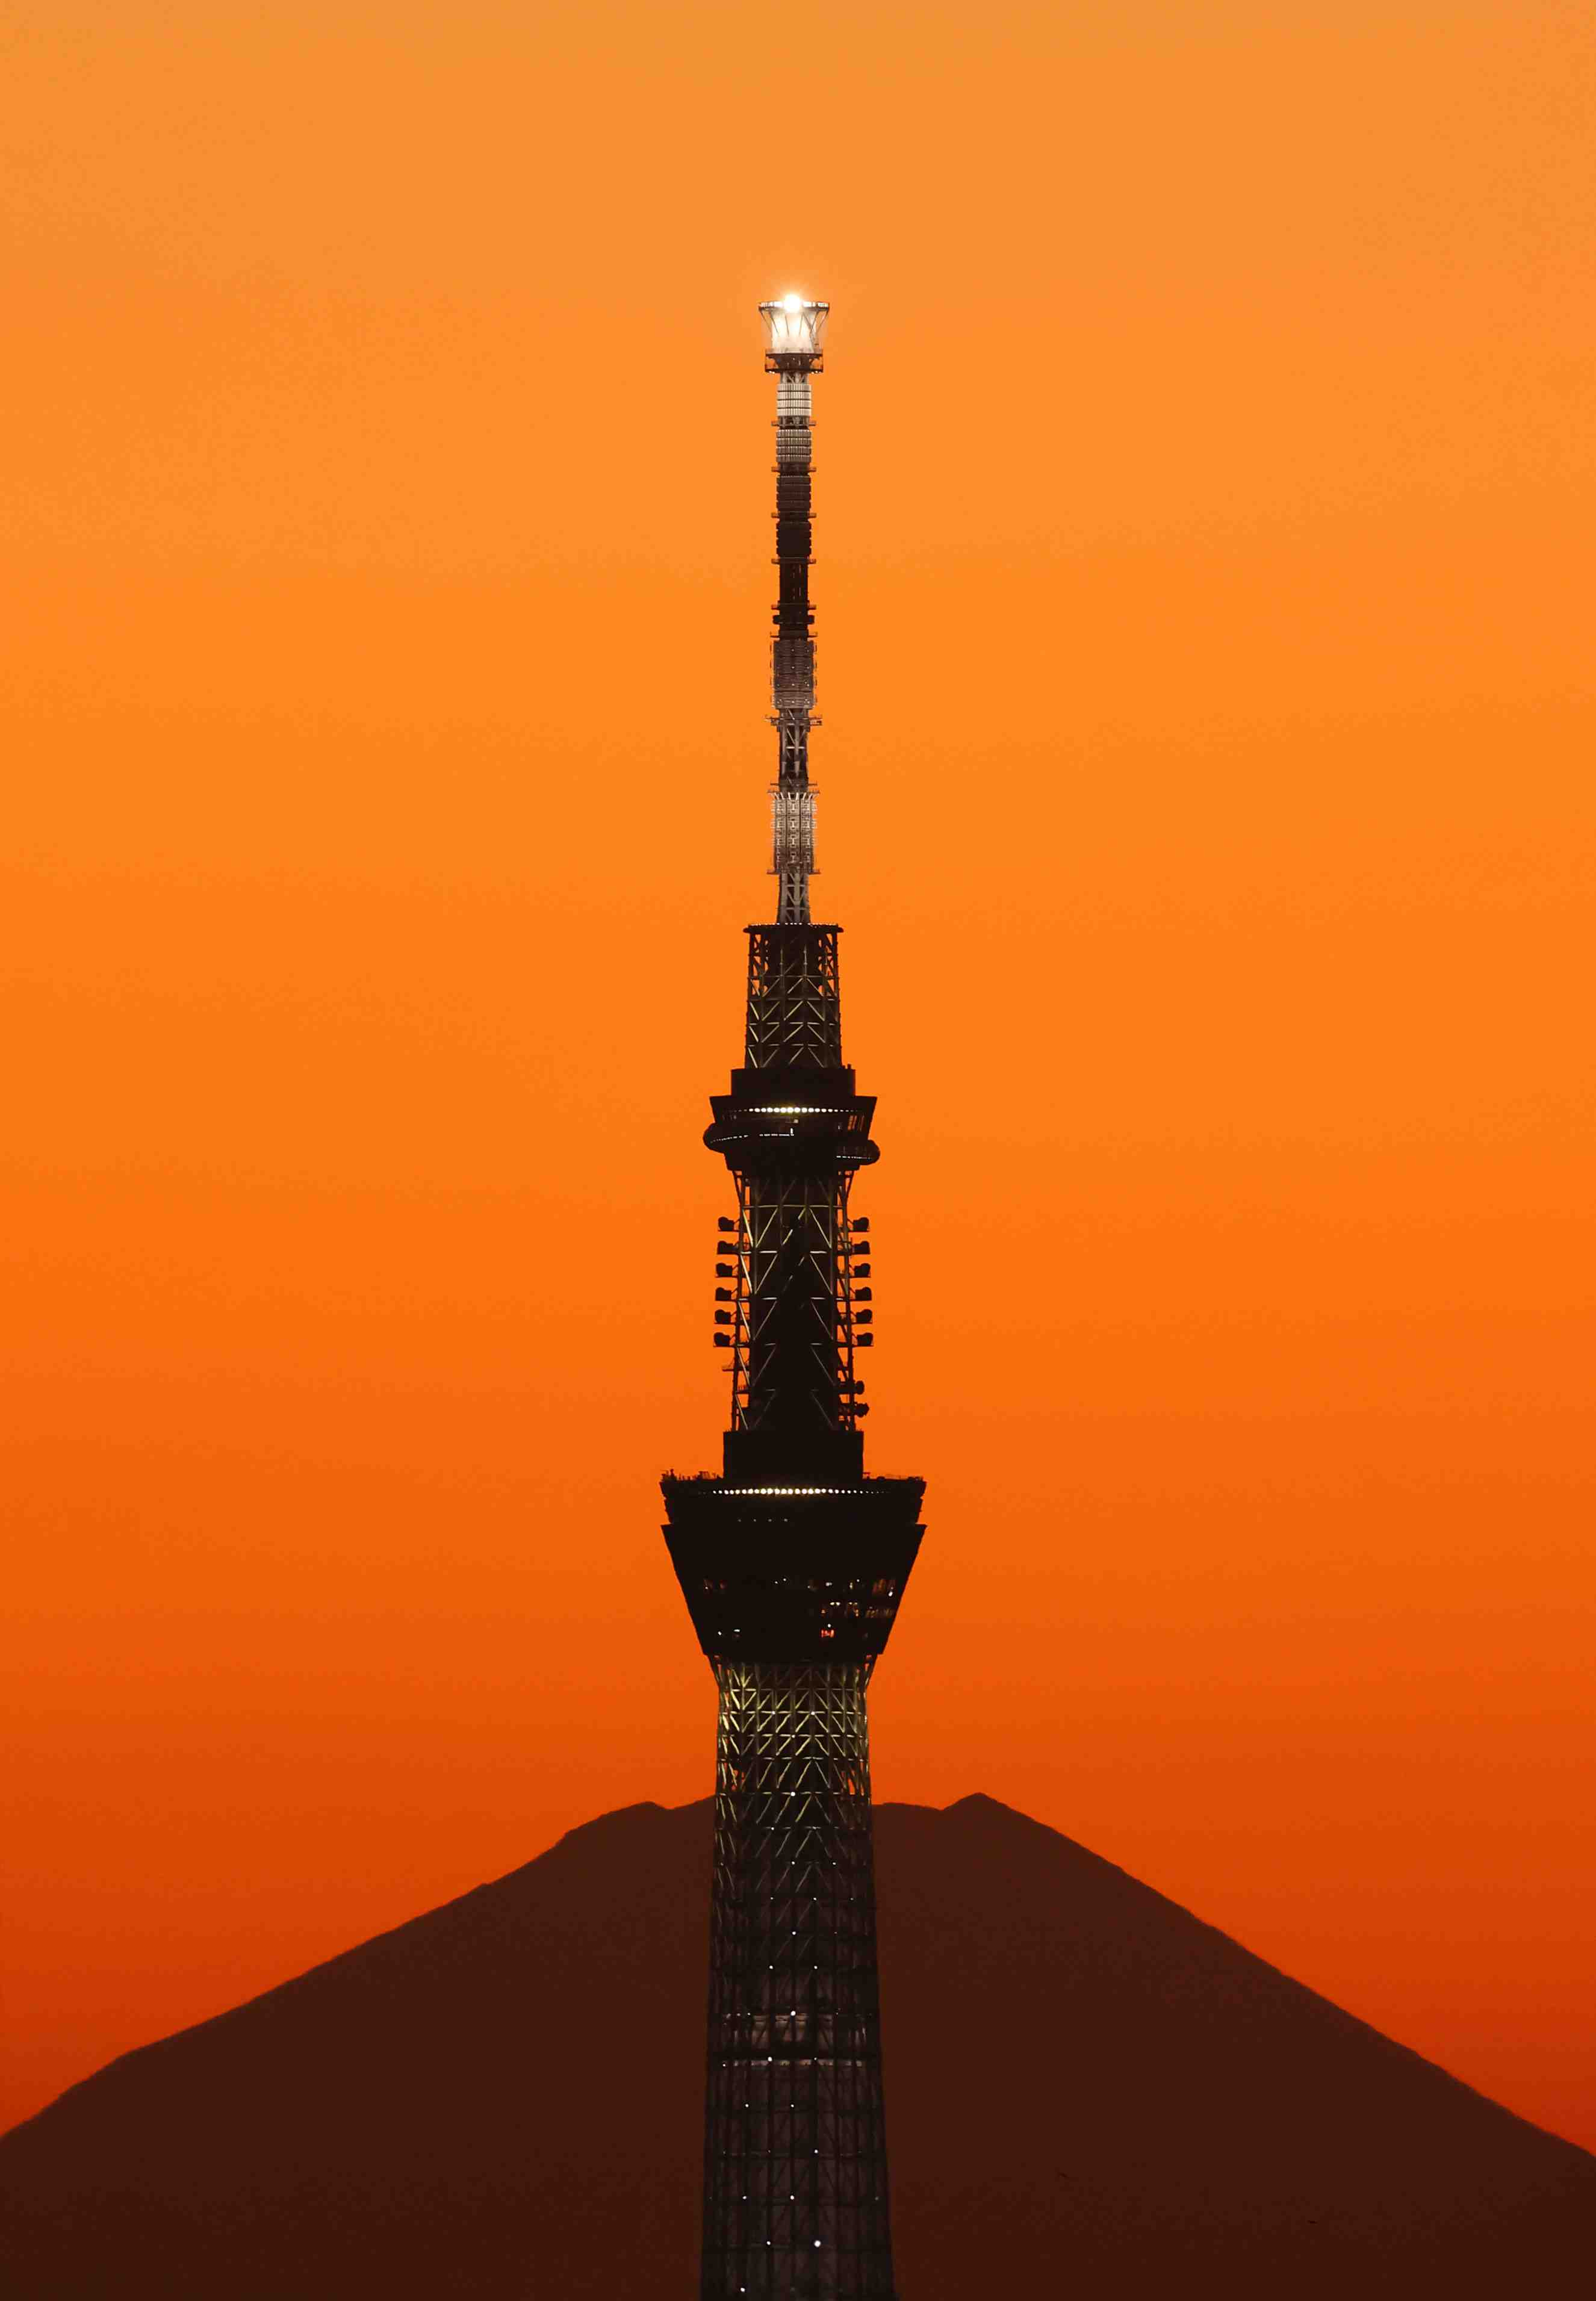 Hokusai Mount Fuji and Tokyo Skytree